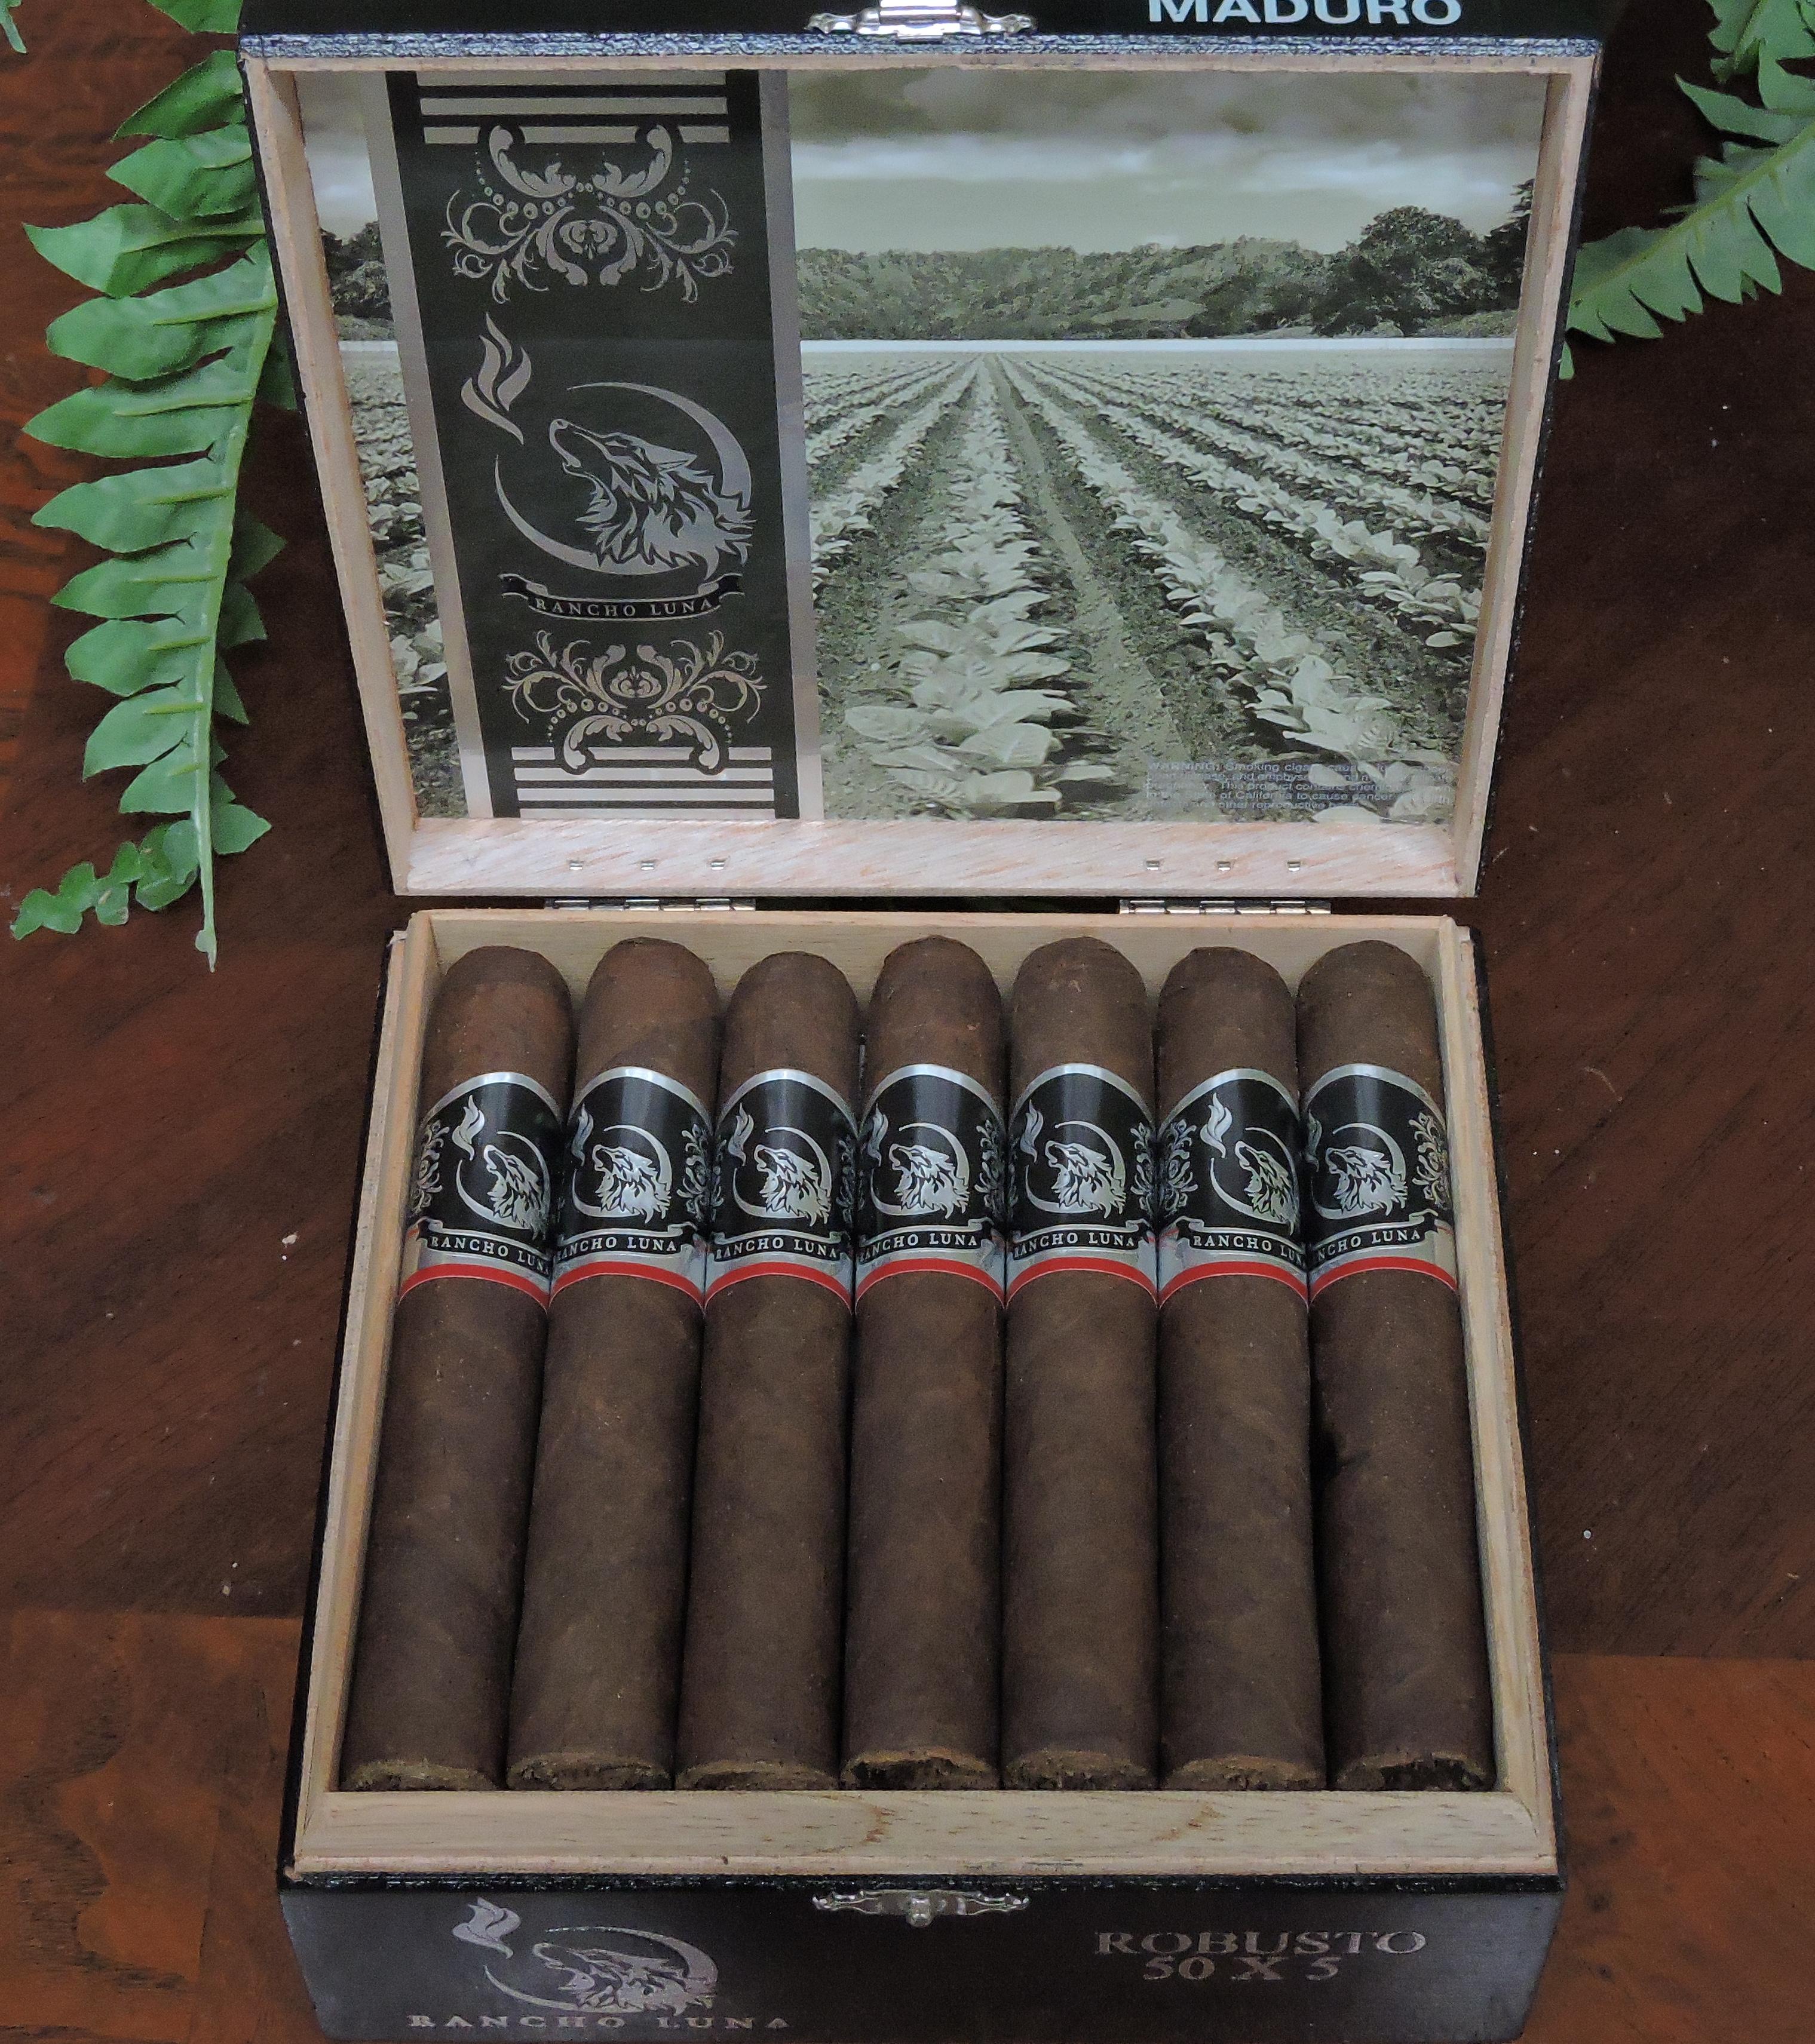 Open Box of the Rancho Luna Maduro Robusto